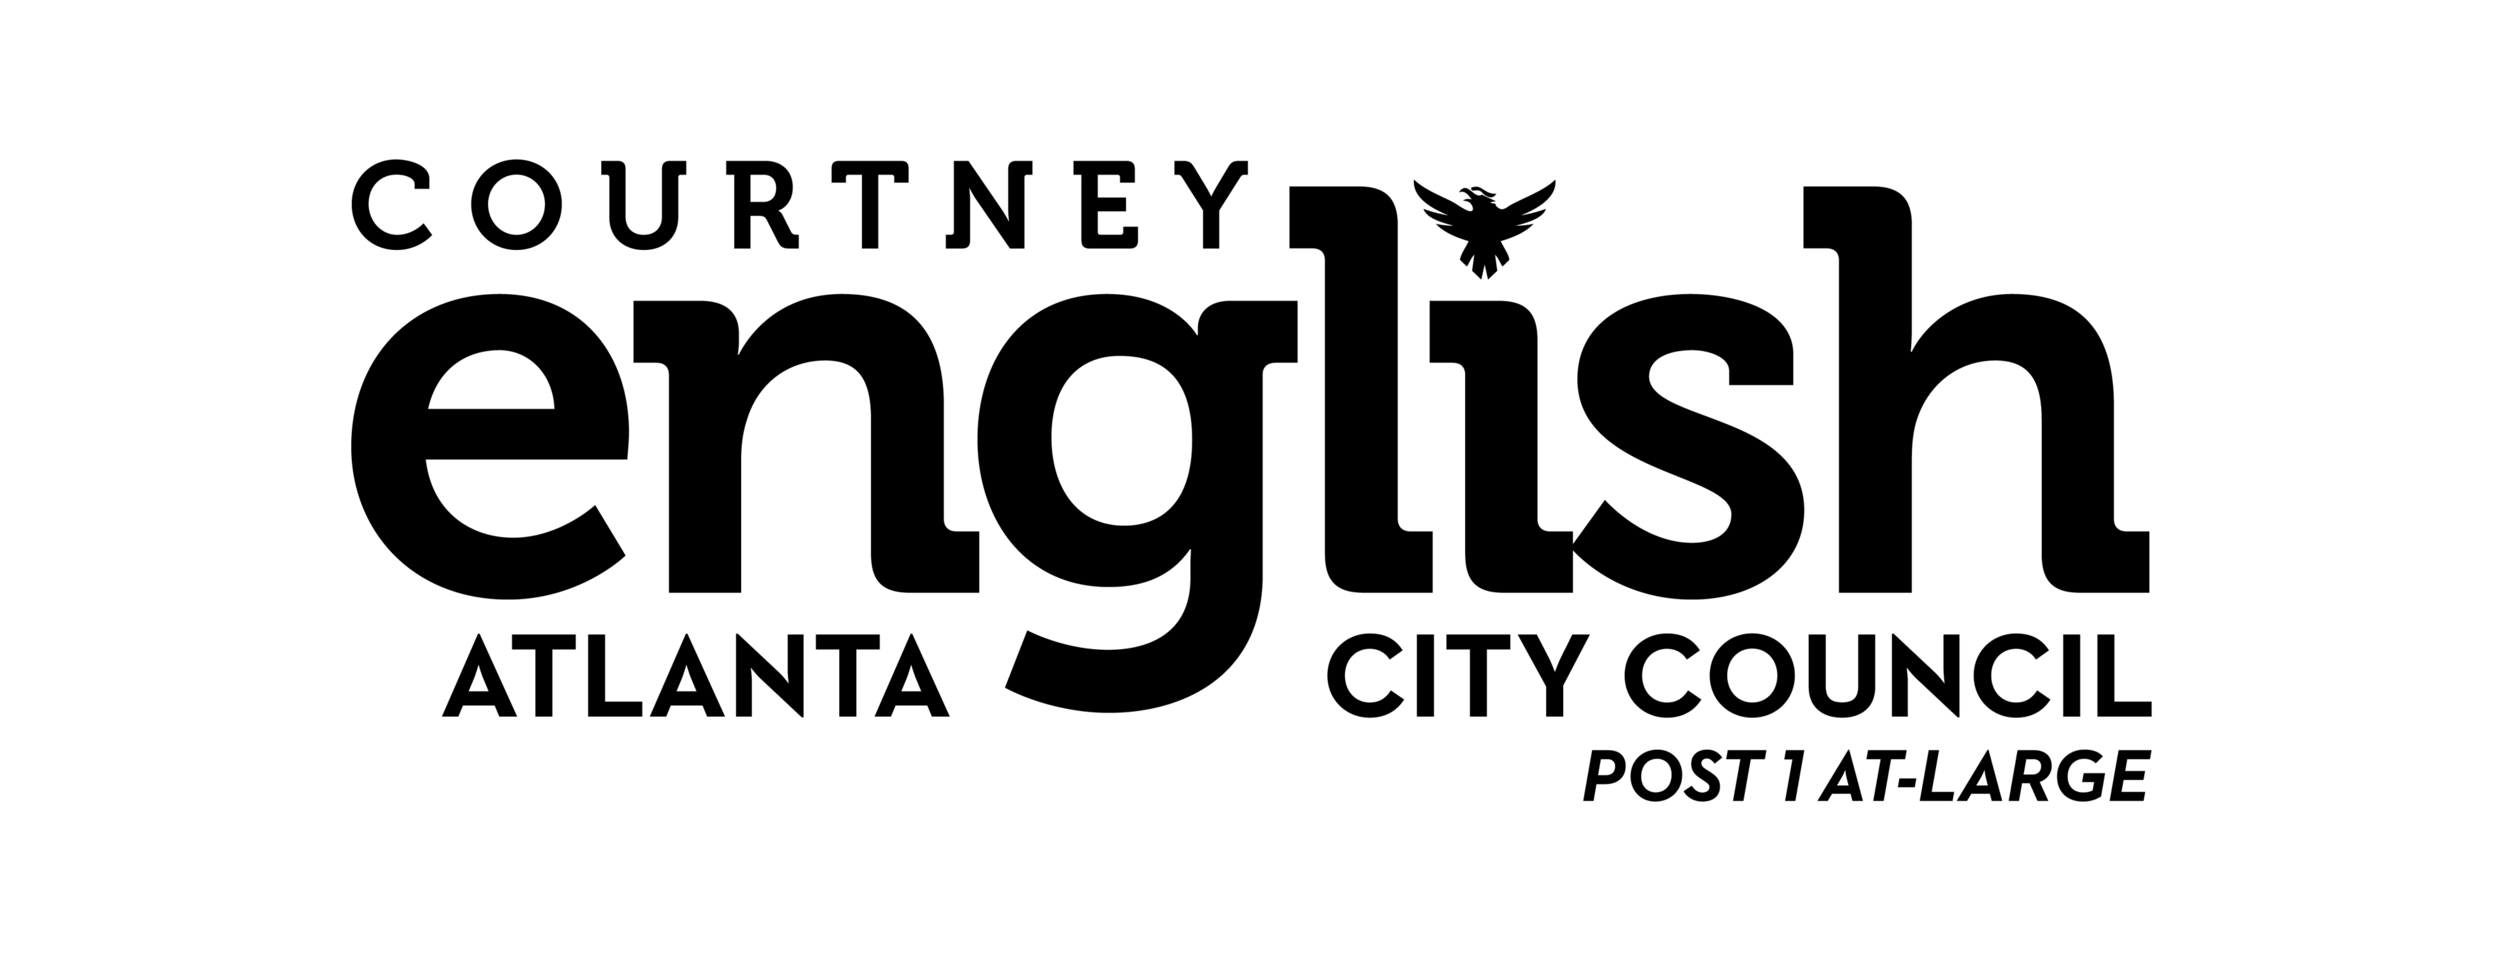 courtney-english-logo-white-smaller.png